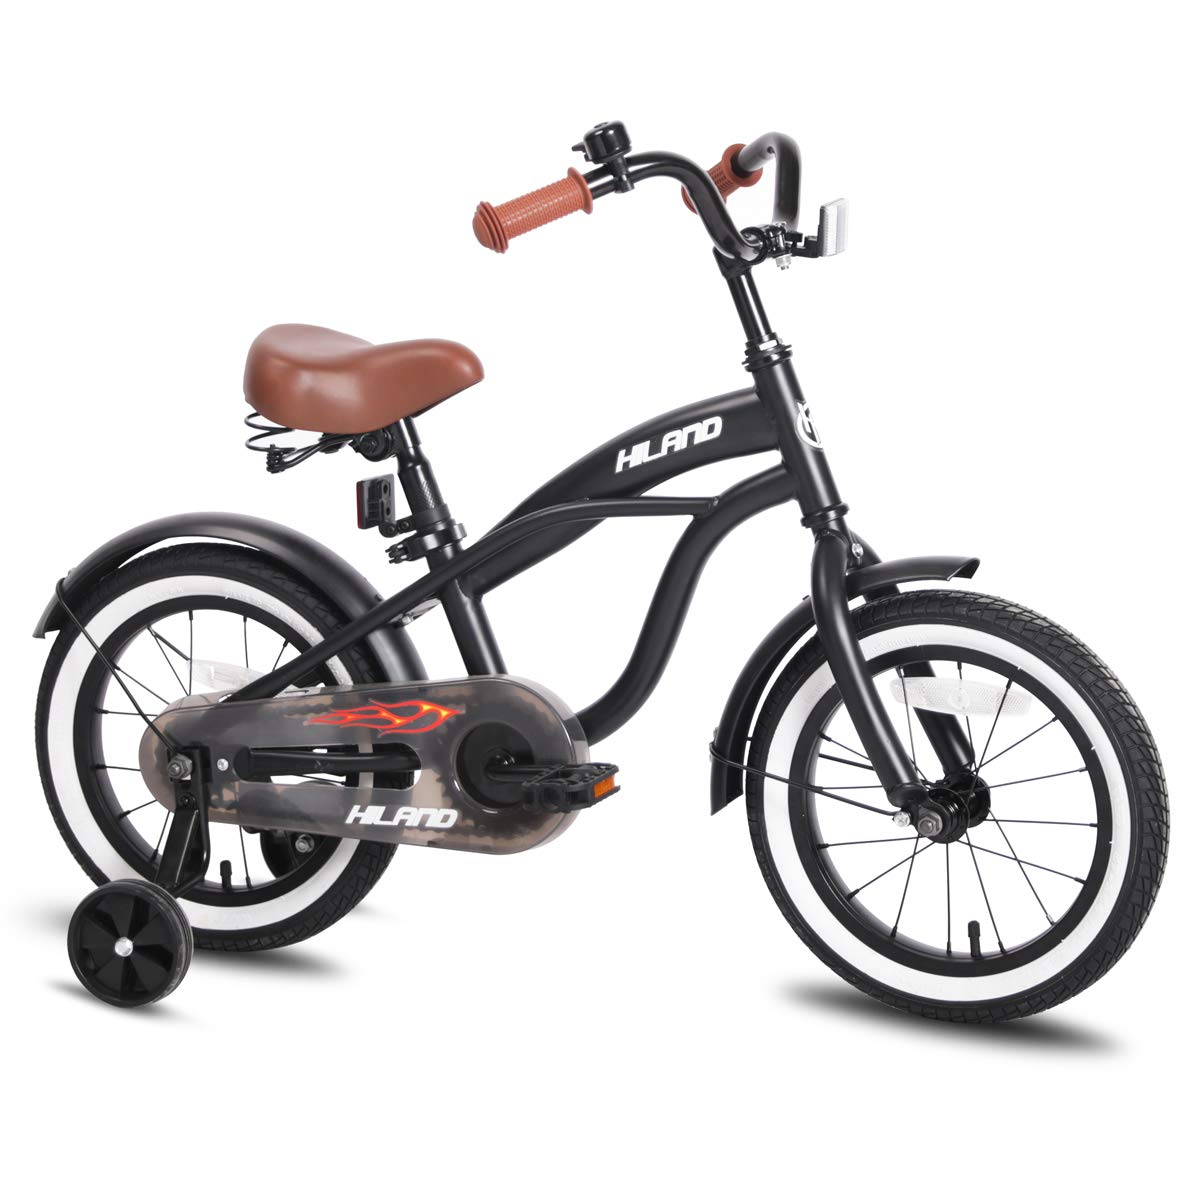 JOYSTAR Kids Bike with Training Wheels for Girls & Boys, 12 14 16 Inch (Red Orange Blue Silver) product image